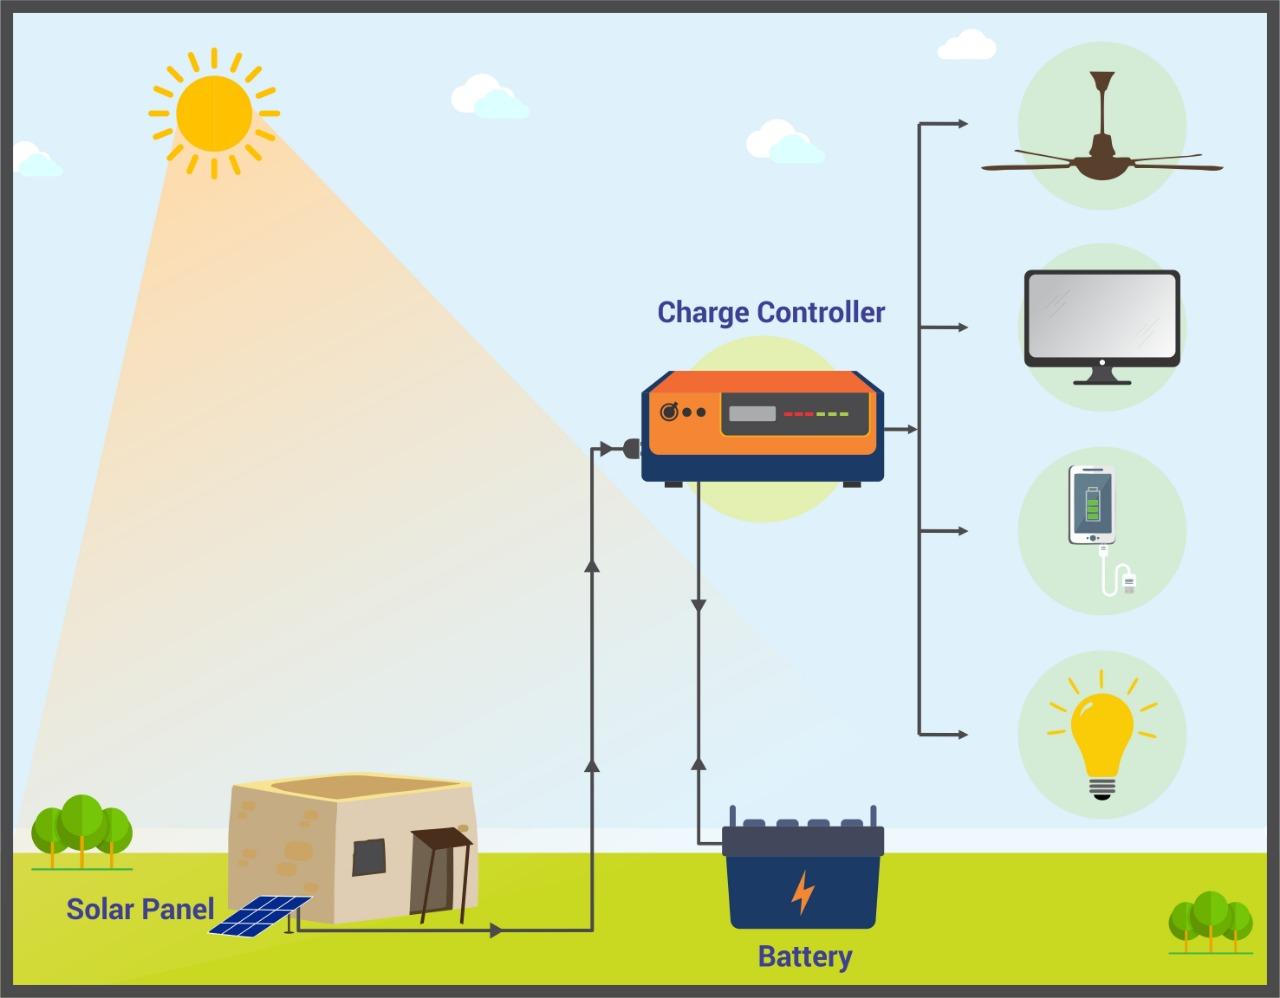 Offgrid Solar DC system